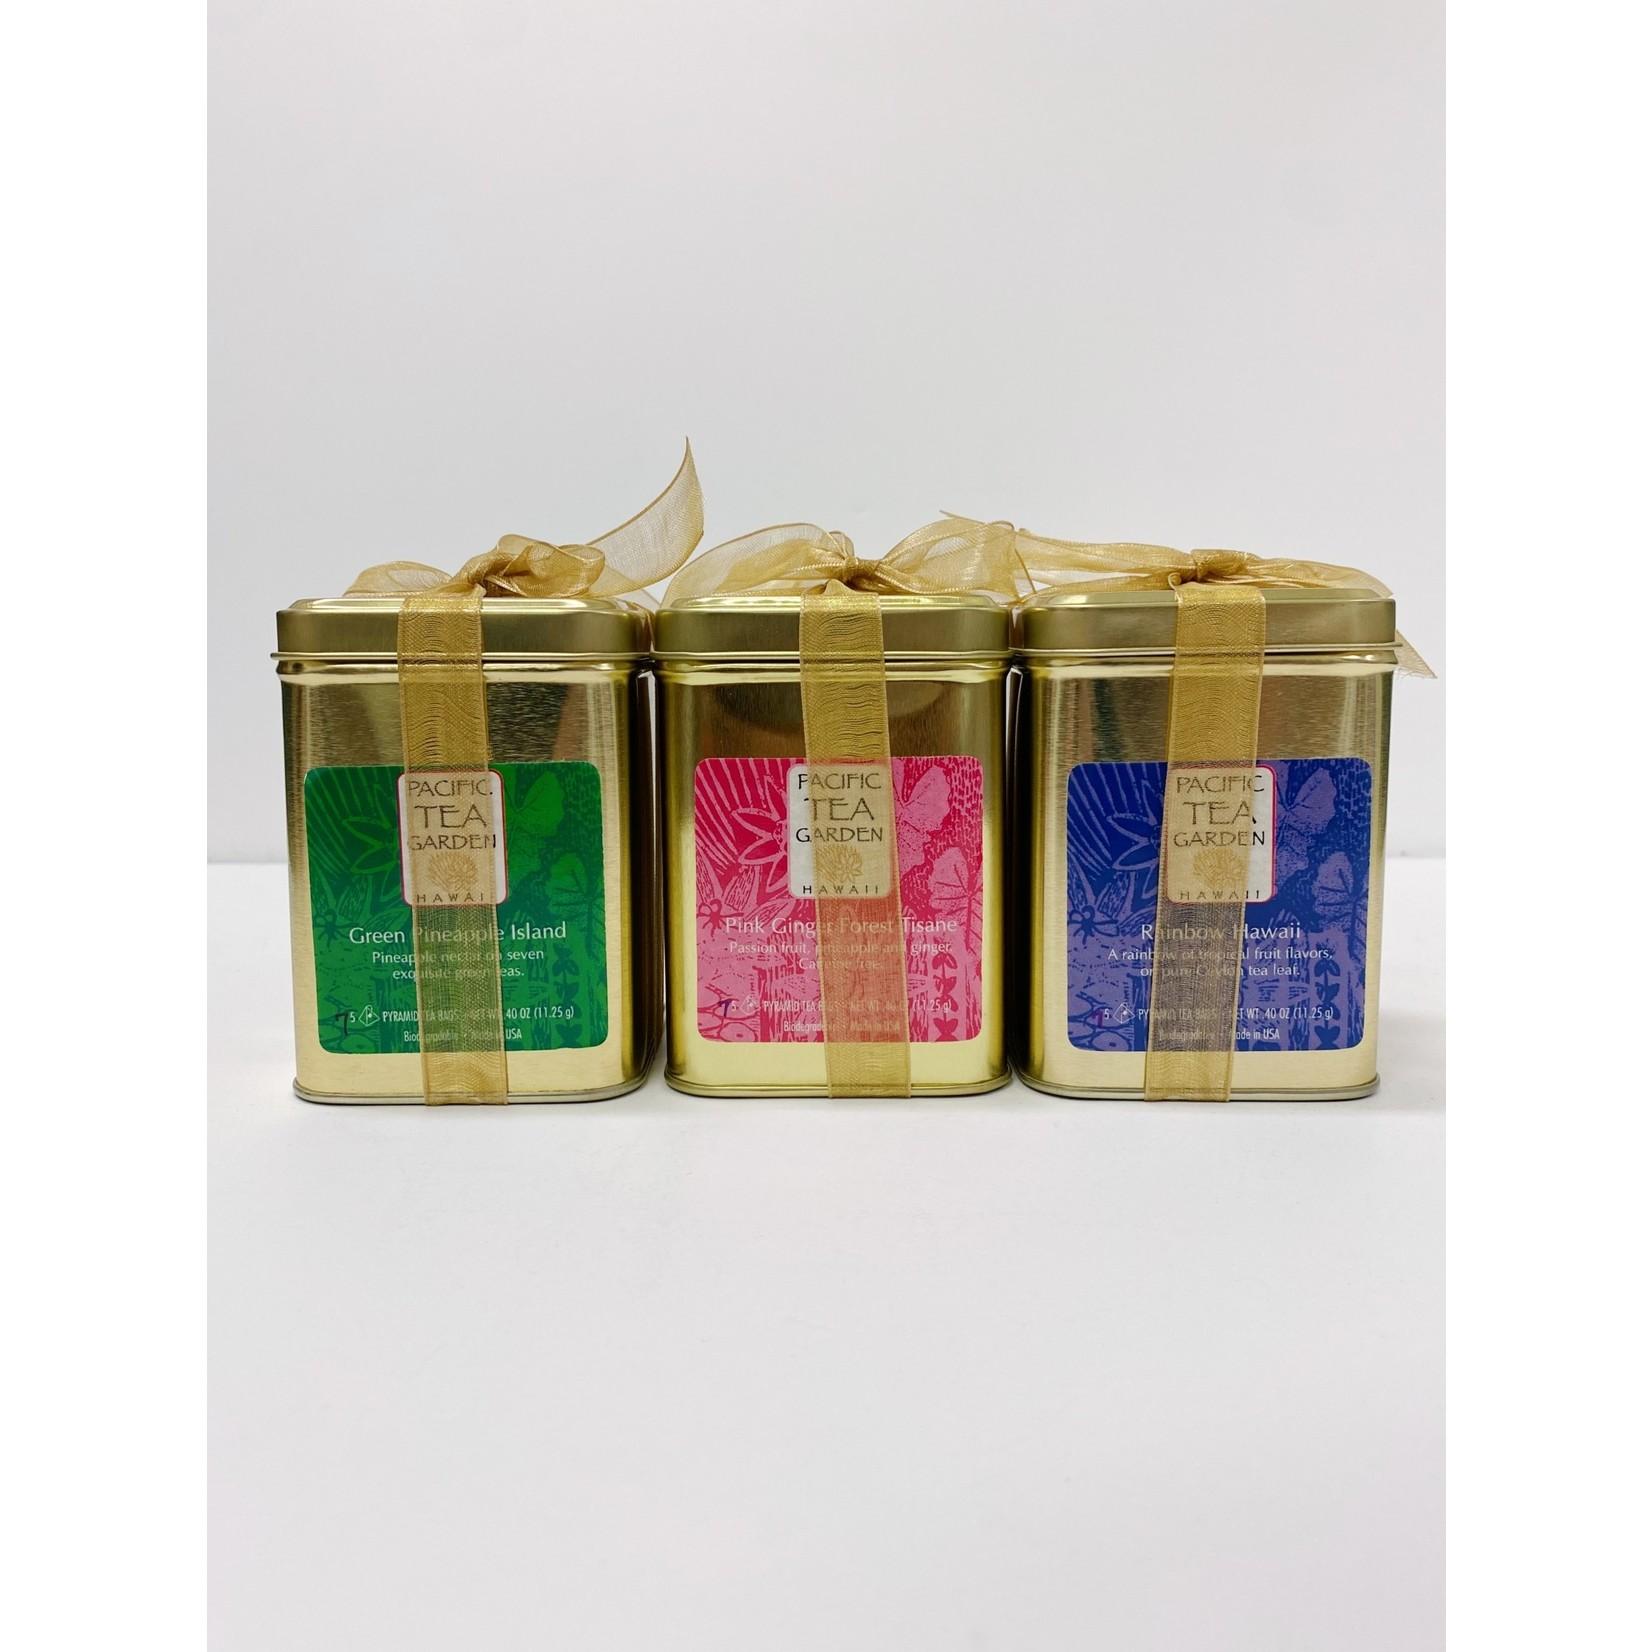 Pacific Tea Garden Tea in Tins